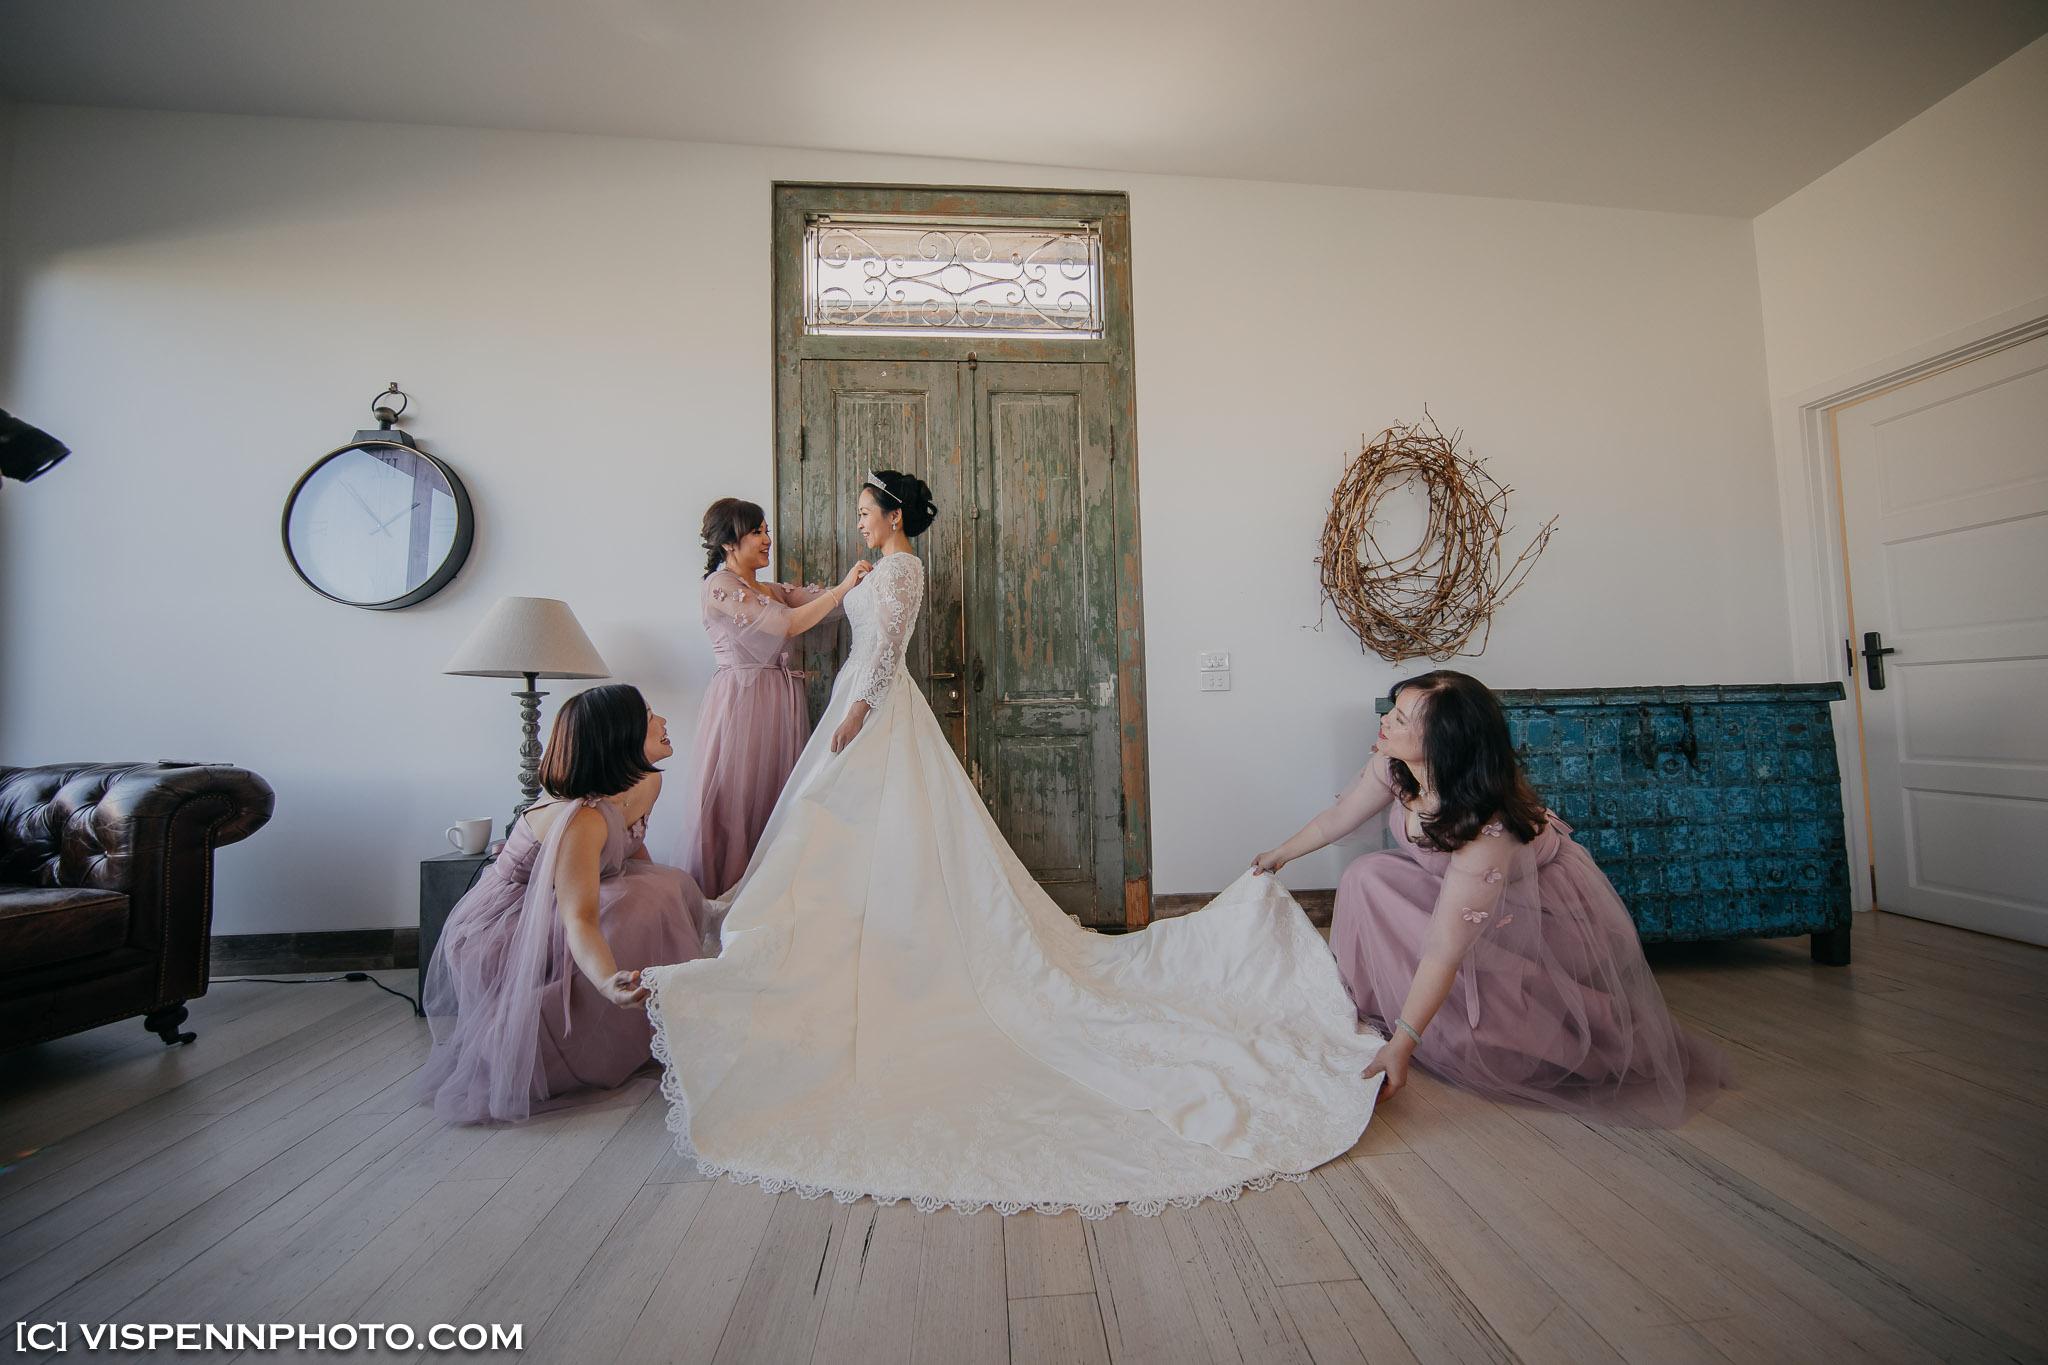 WEDDING DAY Photography Melbourne VISPENN 墨尔本 婚礼跟拍 婚礼摄像 婚礼摄影 结婚照 登记照 CoreyCoco 2P 05793 5D4 VISPENN